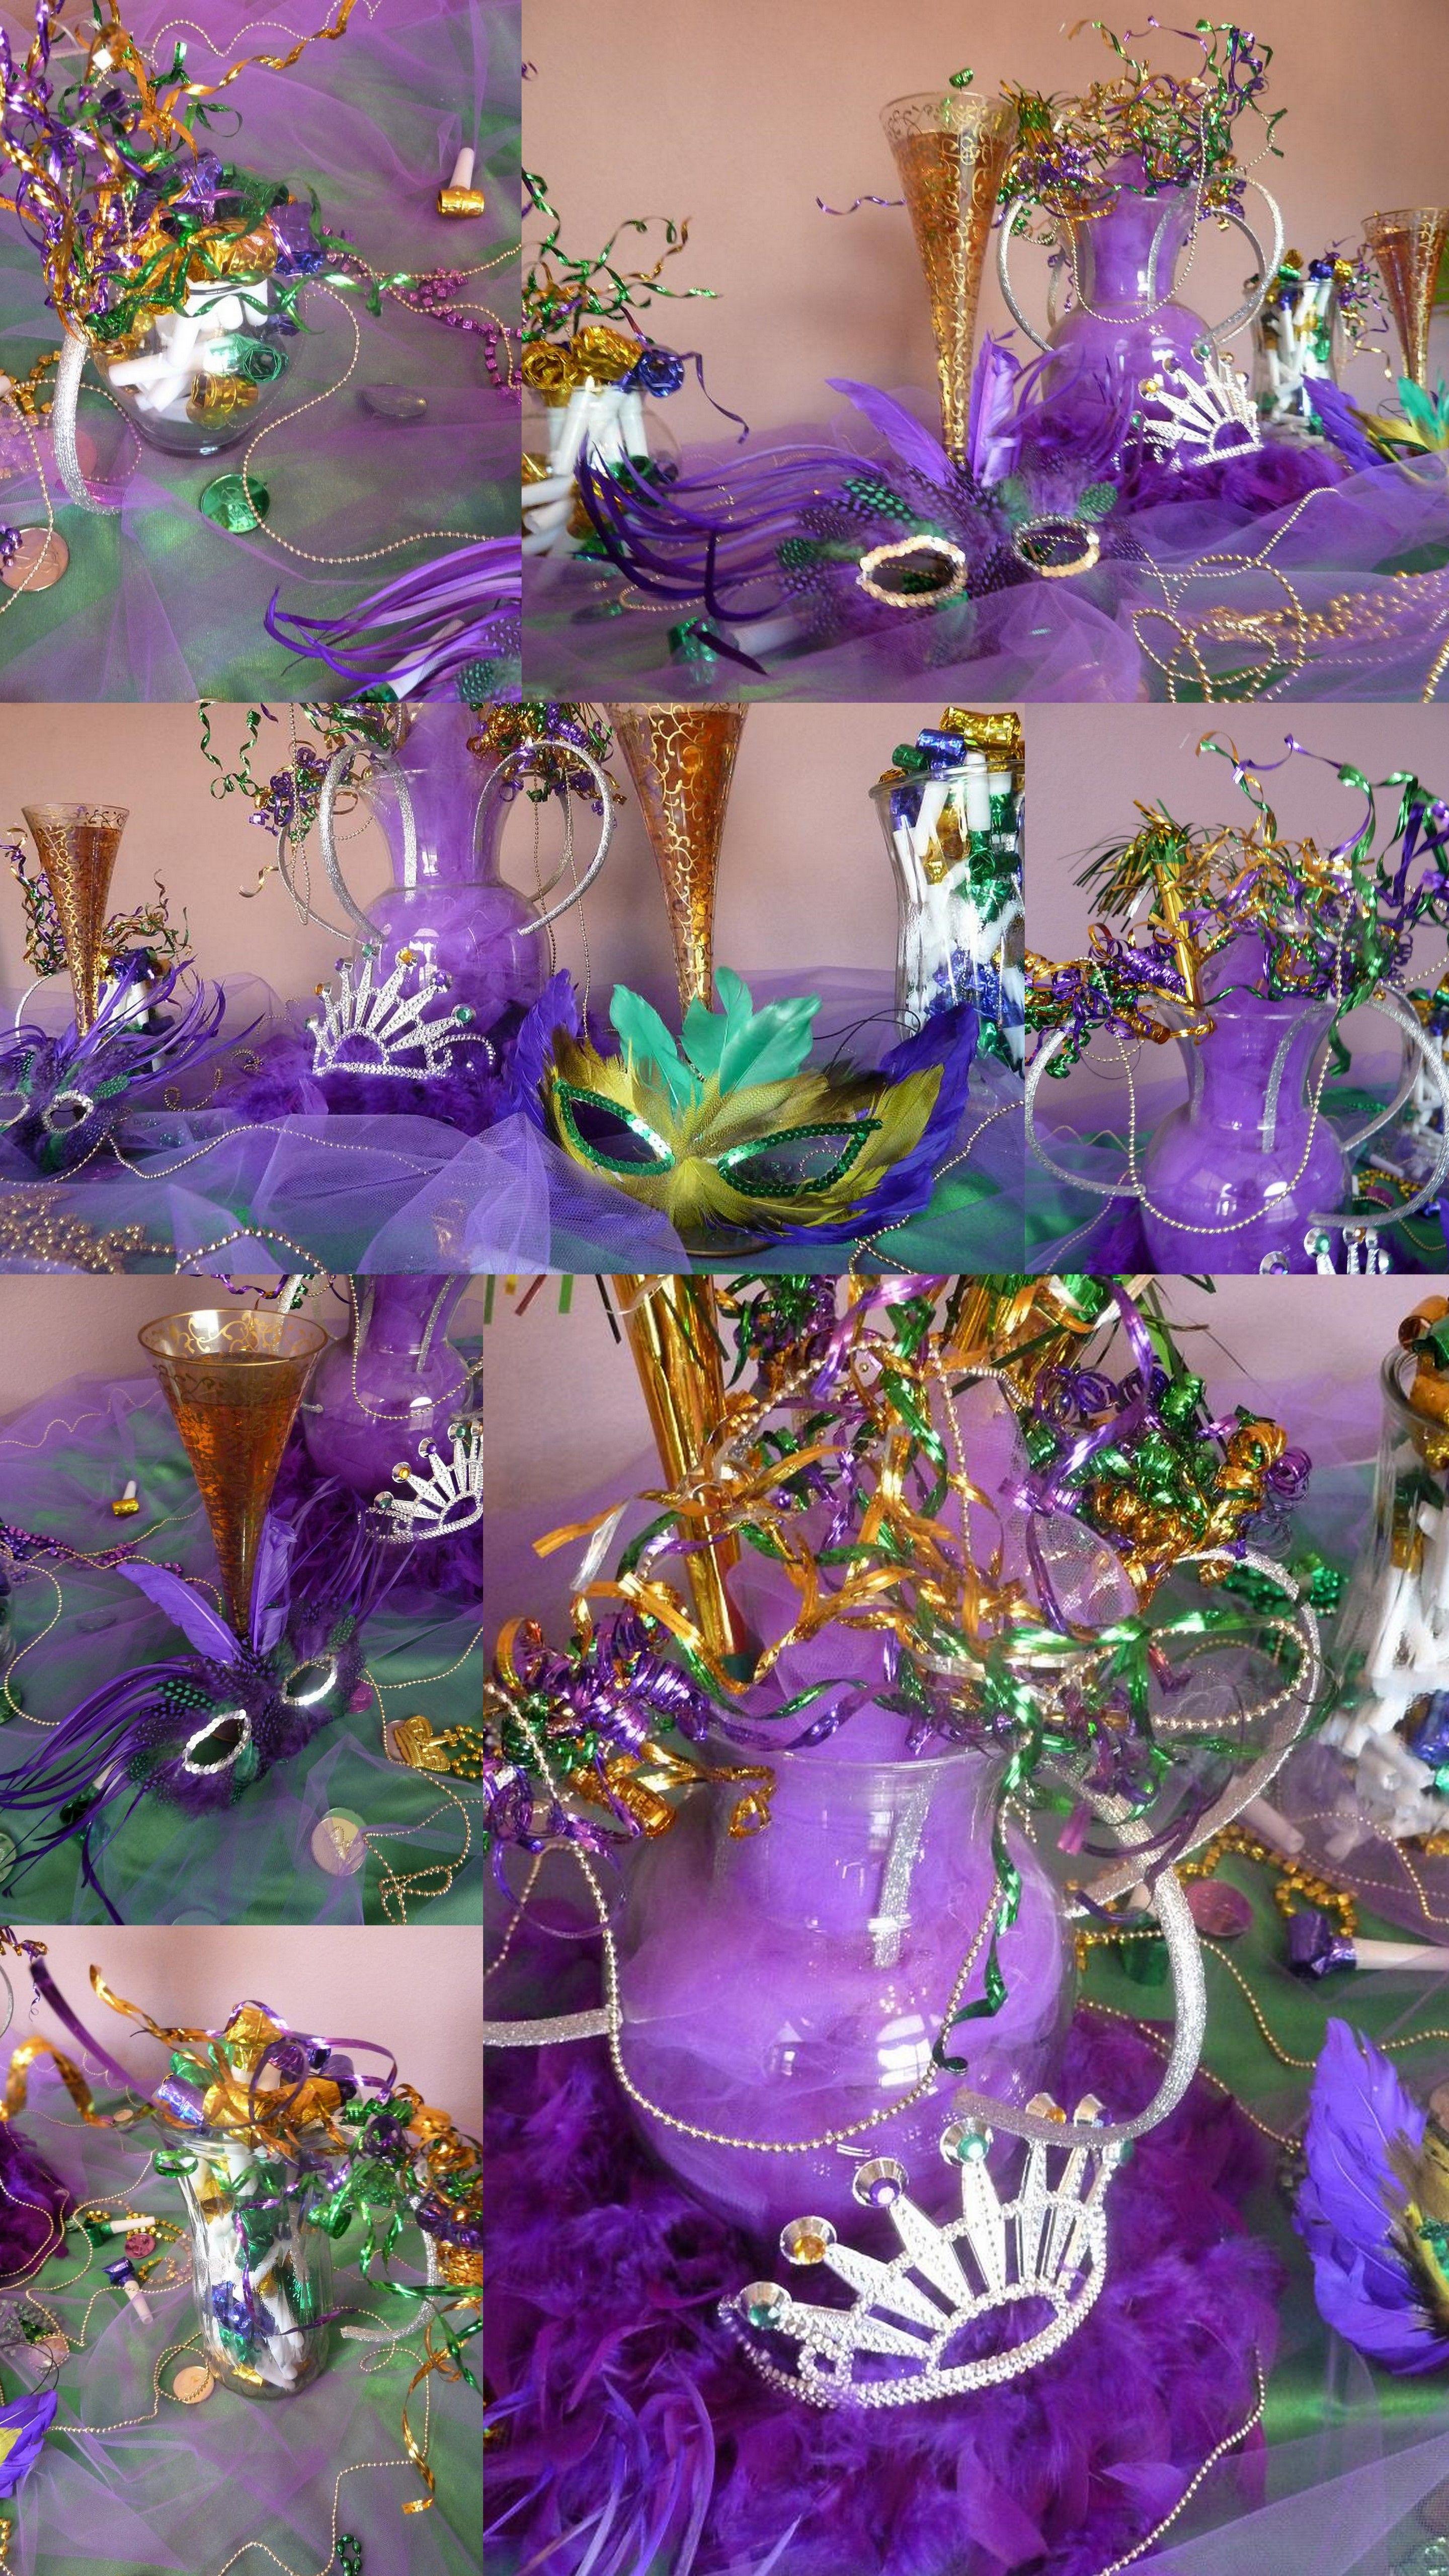 mardi gras party ideas - google search | mardi gras party in 2018